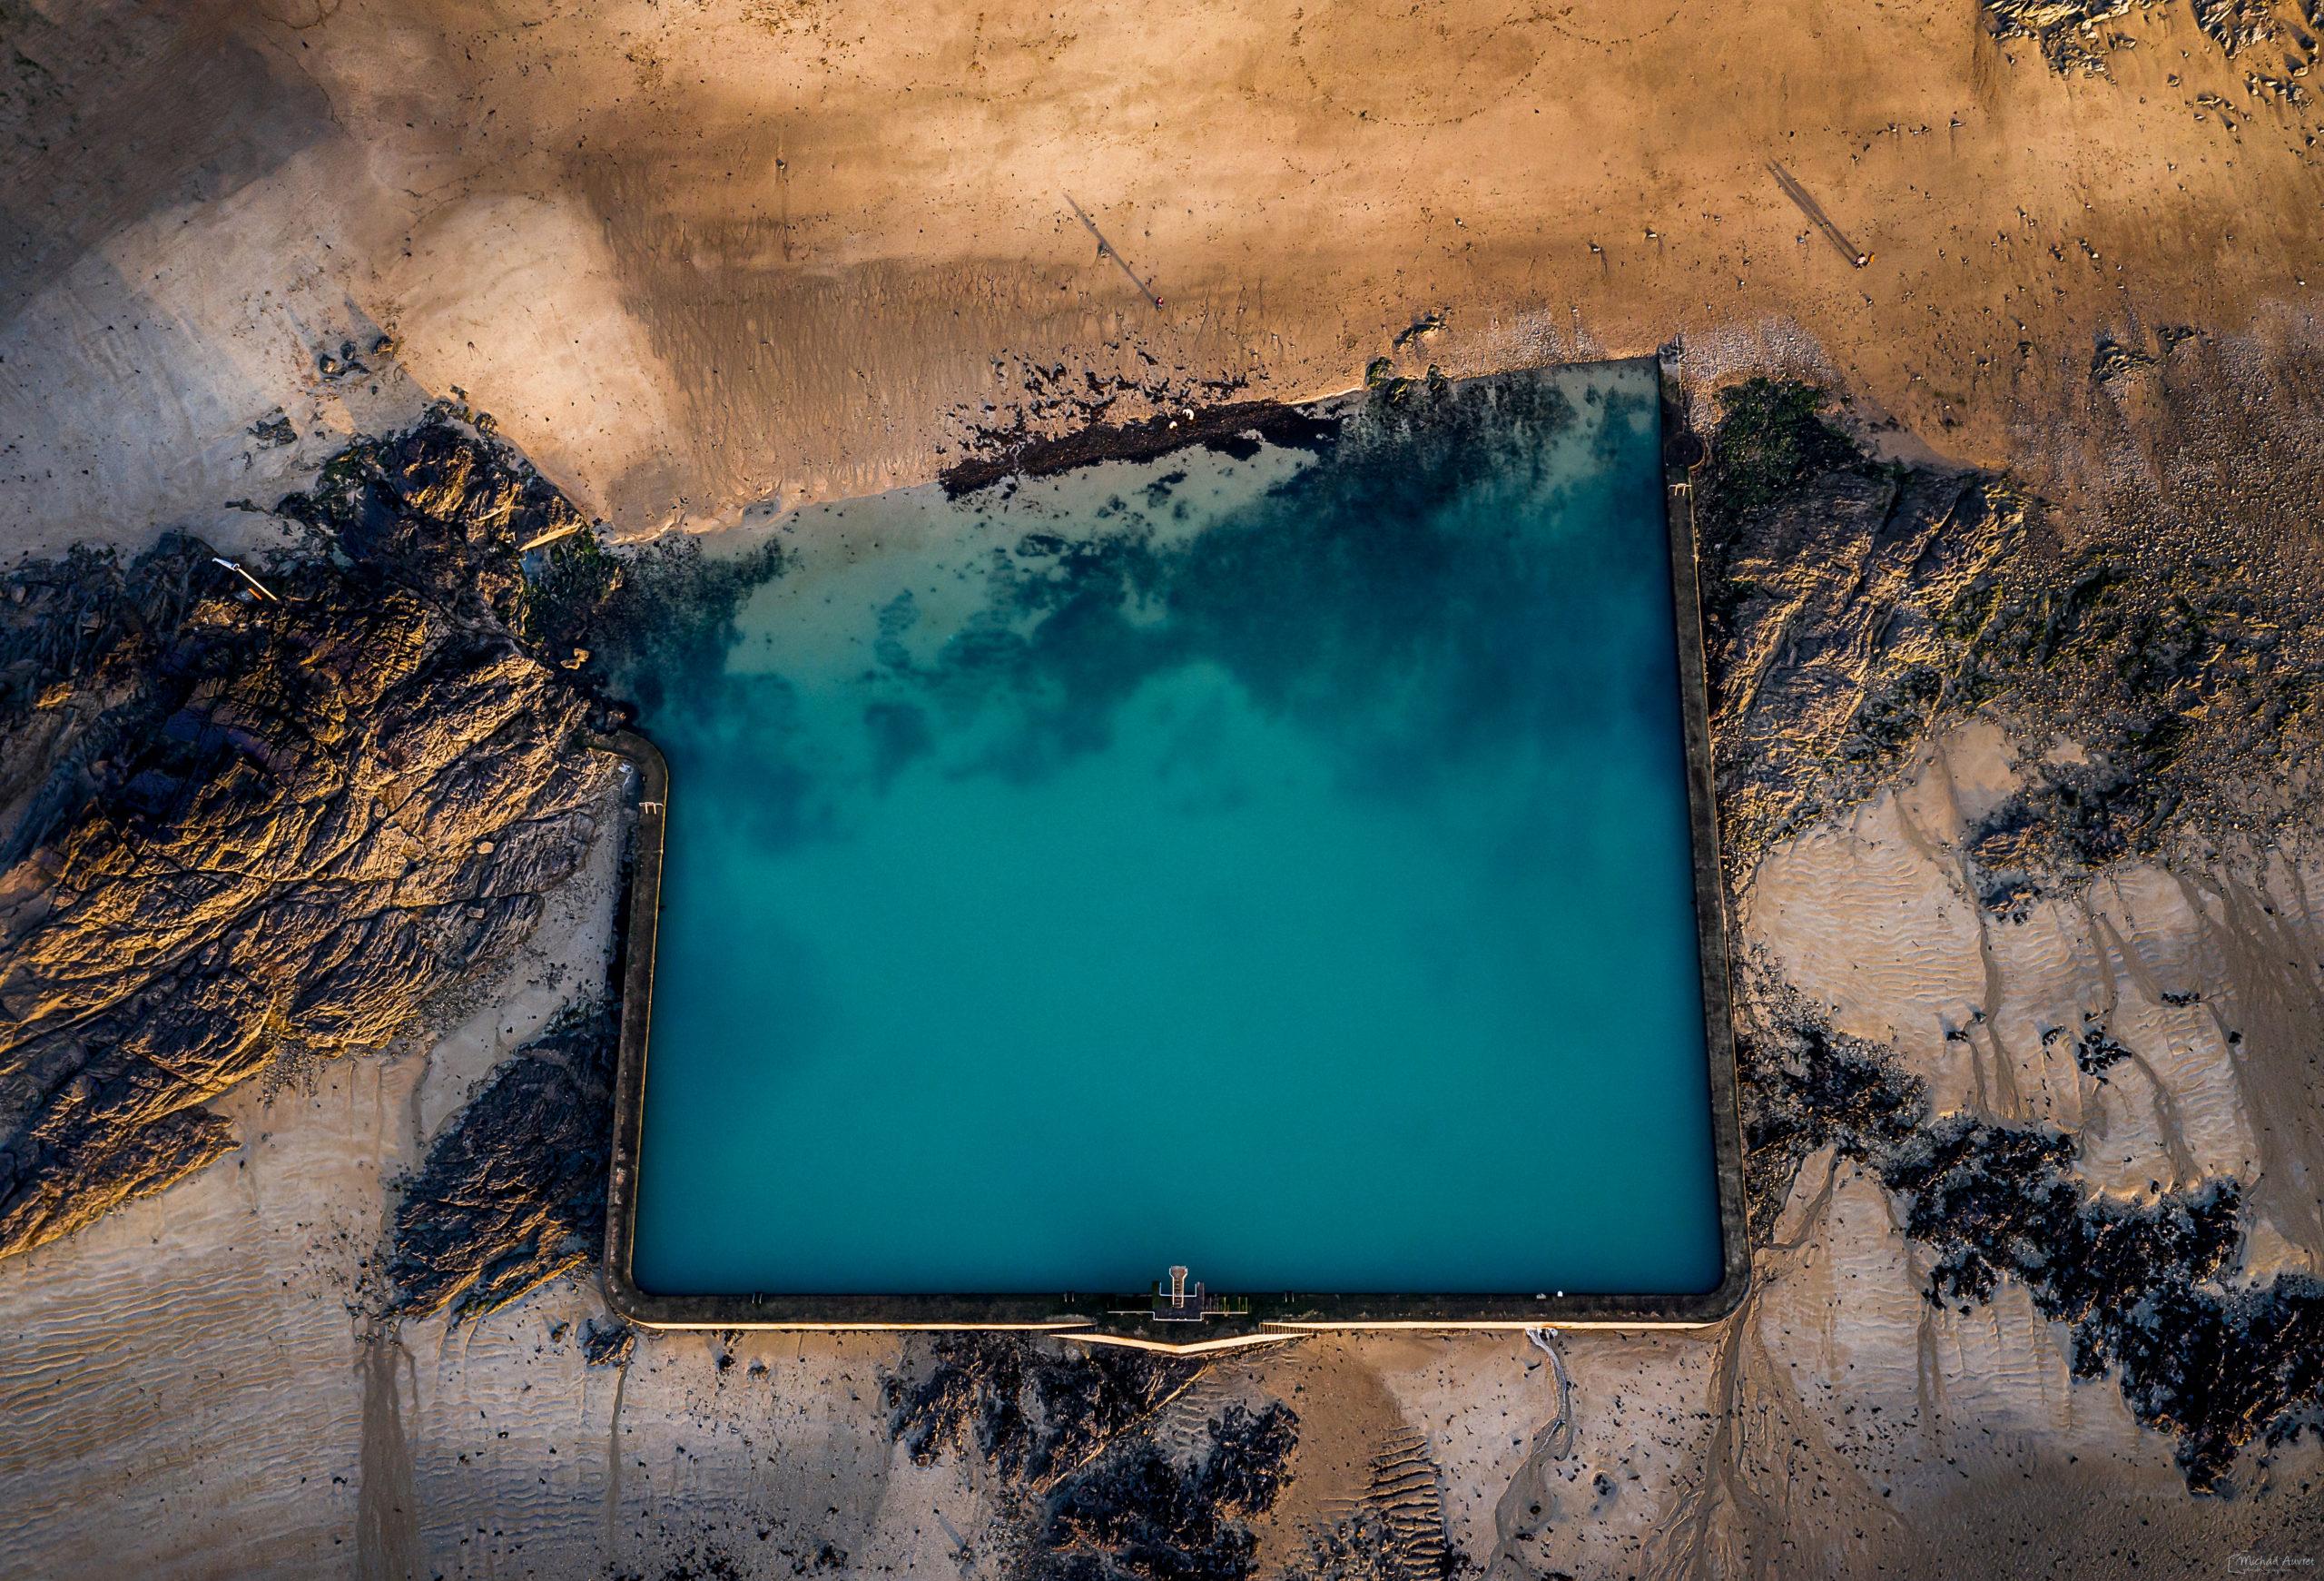 Saint Malo plongeoir piscine bon secours